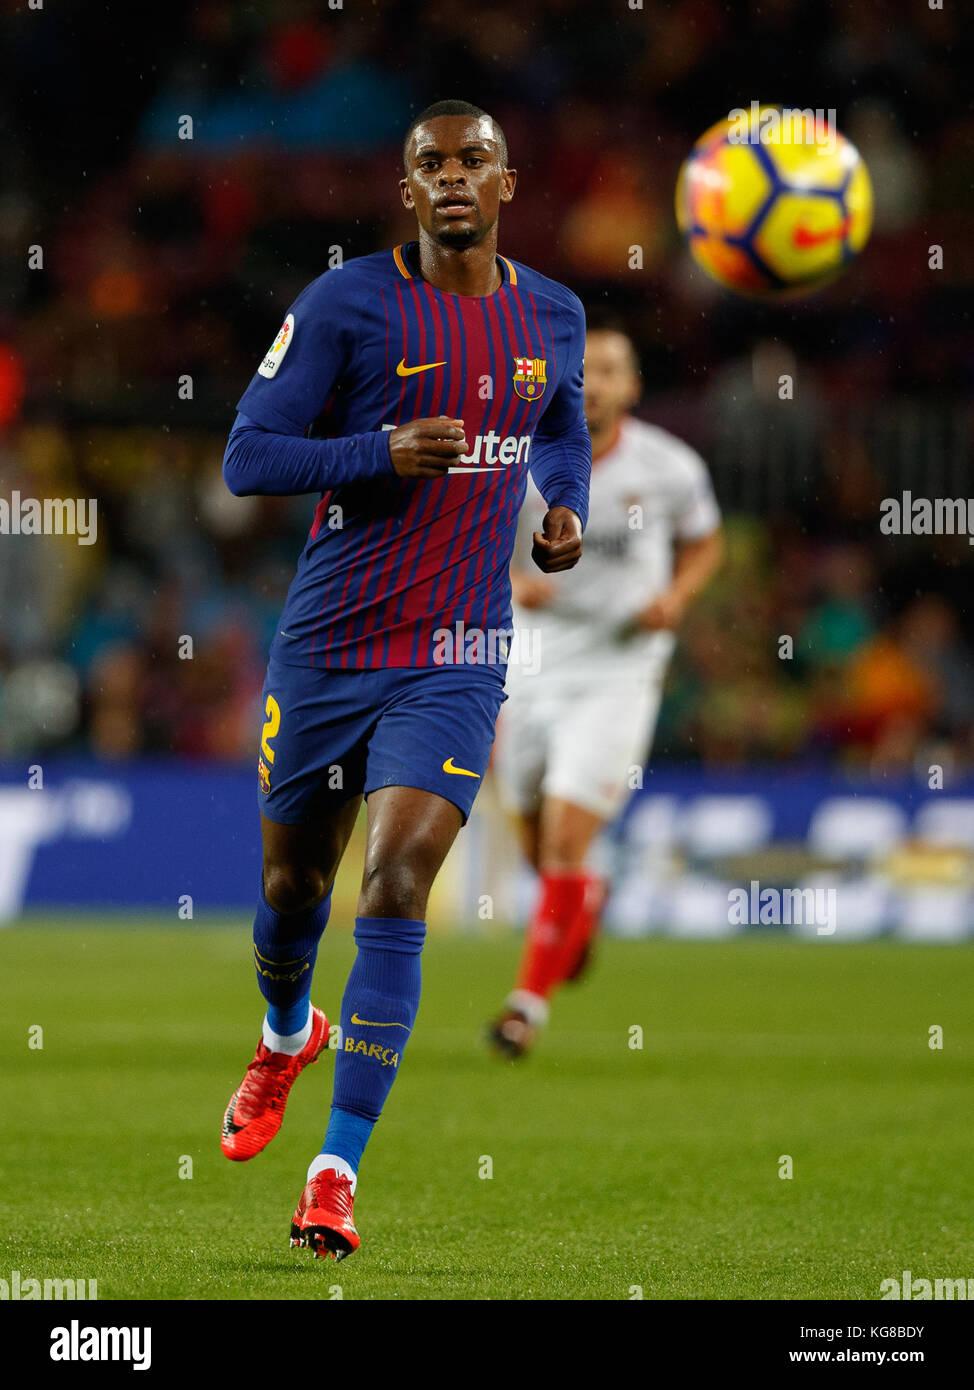 Barcelona, Spain. 4th November, 2017. Match between FC Barcelona and Sevilla FC in Camp Nou stadium. Semedo Credit: - Stock Image